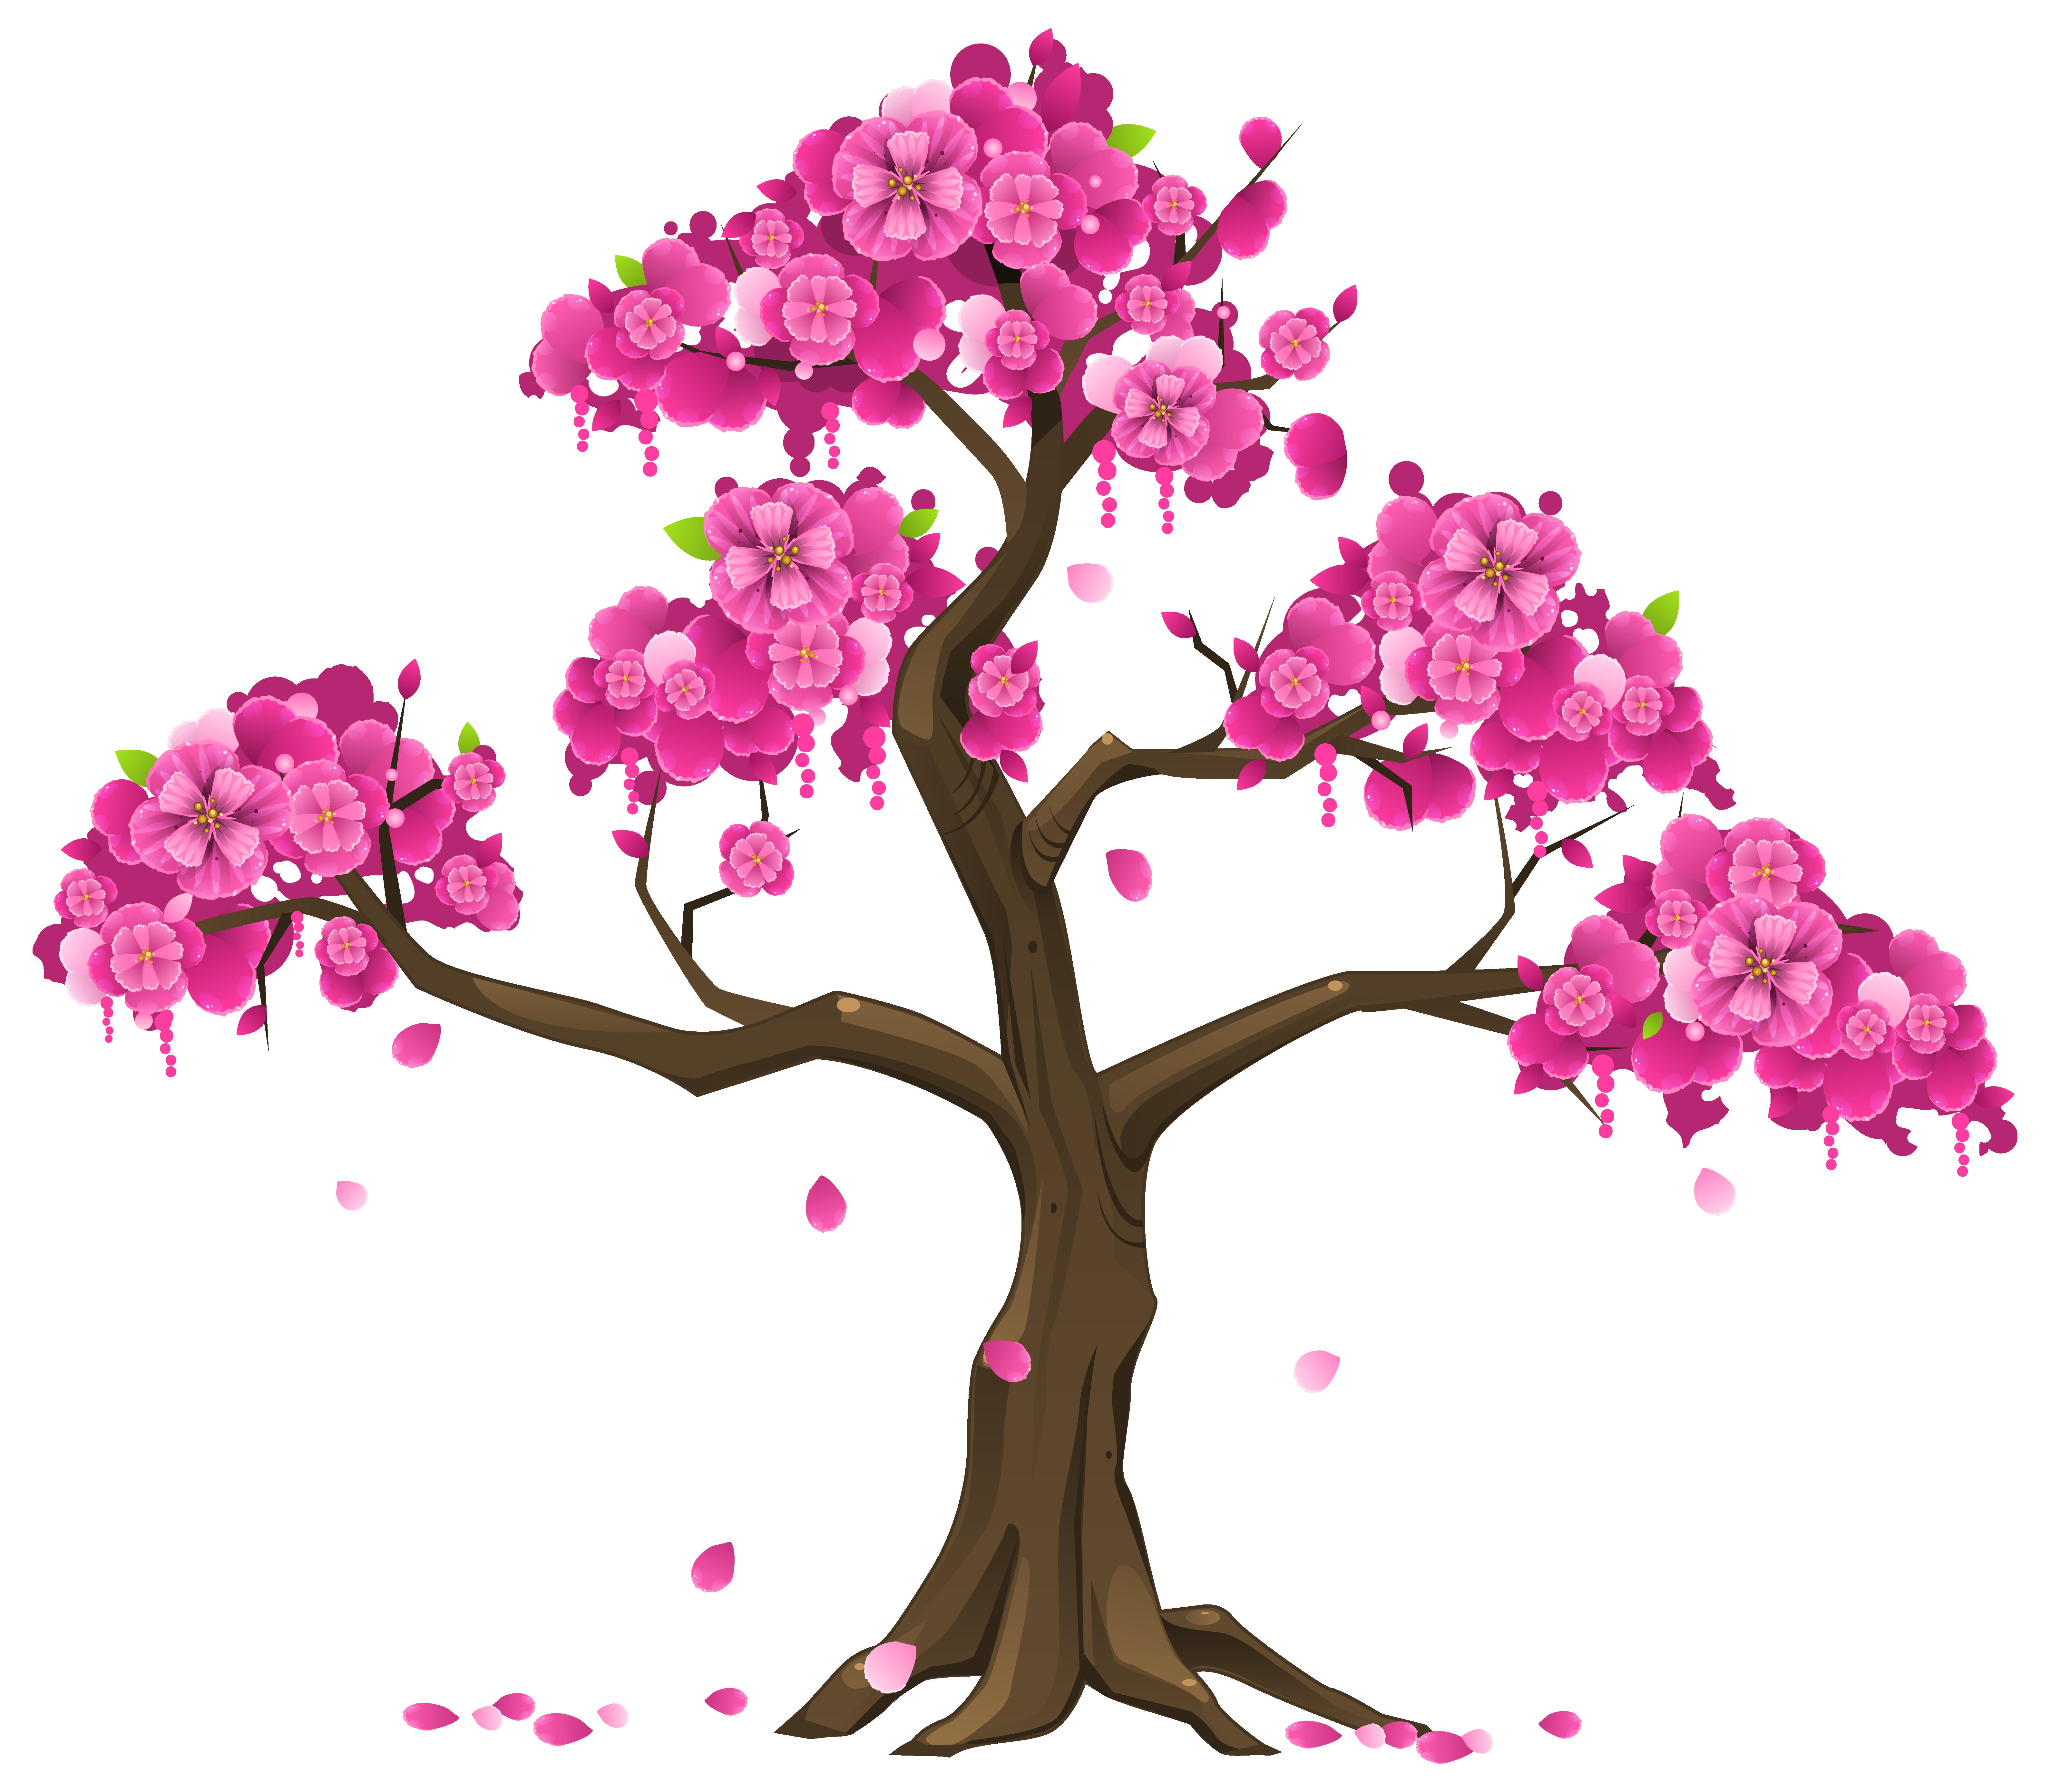 Flower tree clipart png jpg transparent stock Pink Tree PNG Clipart Image jpg transparent stock